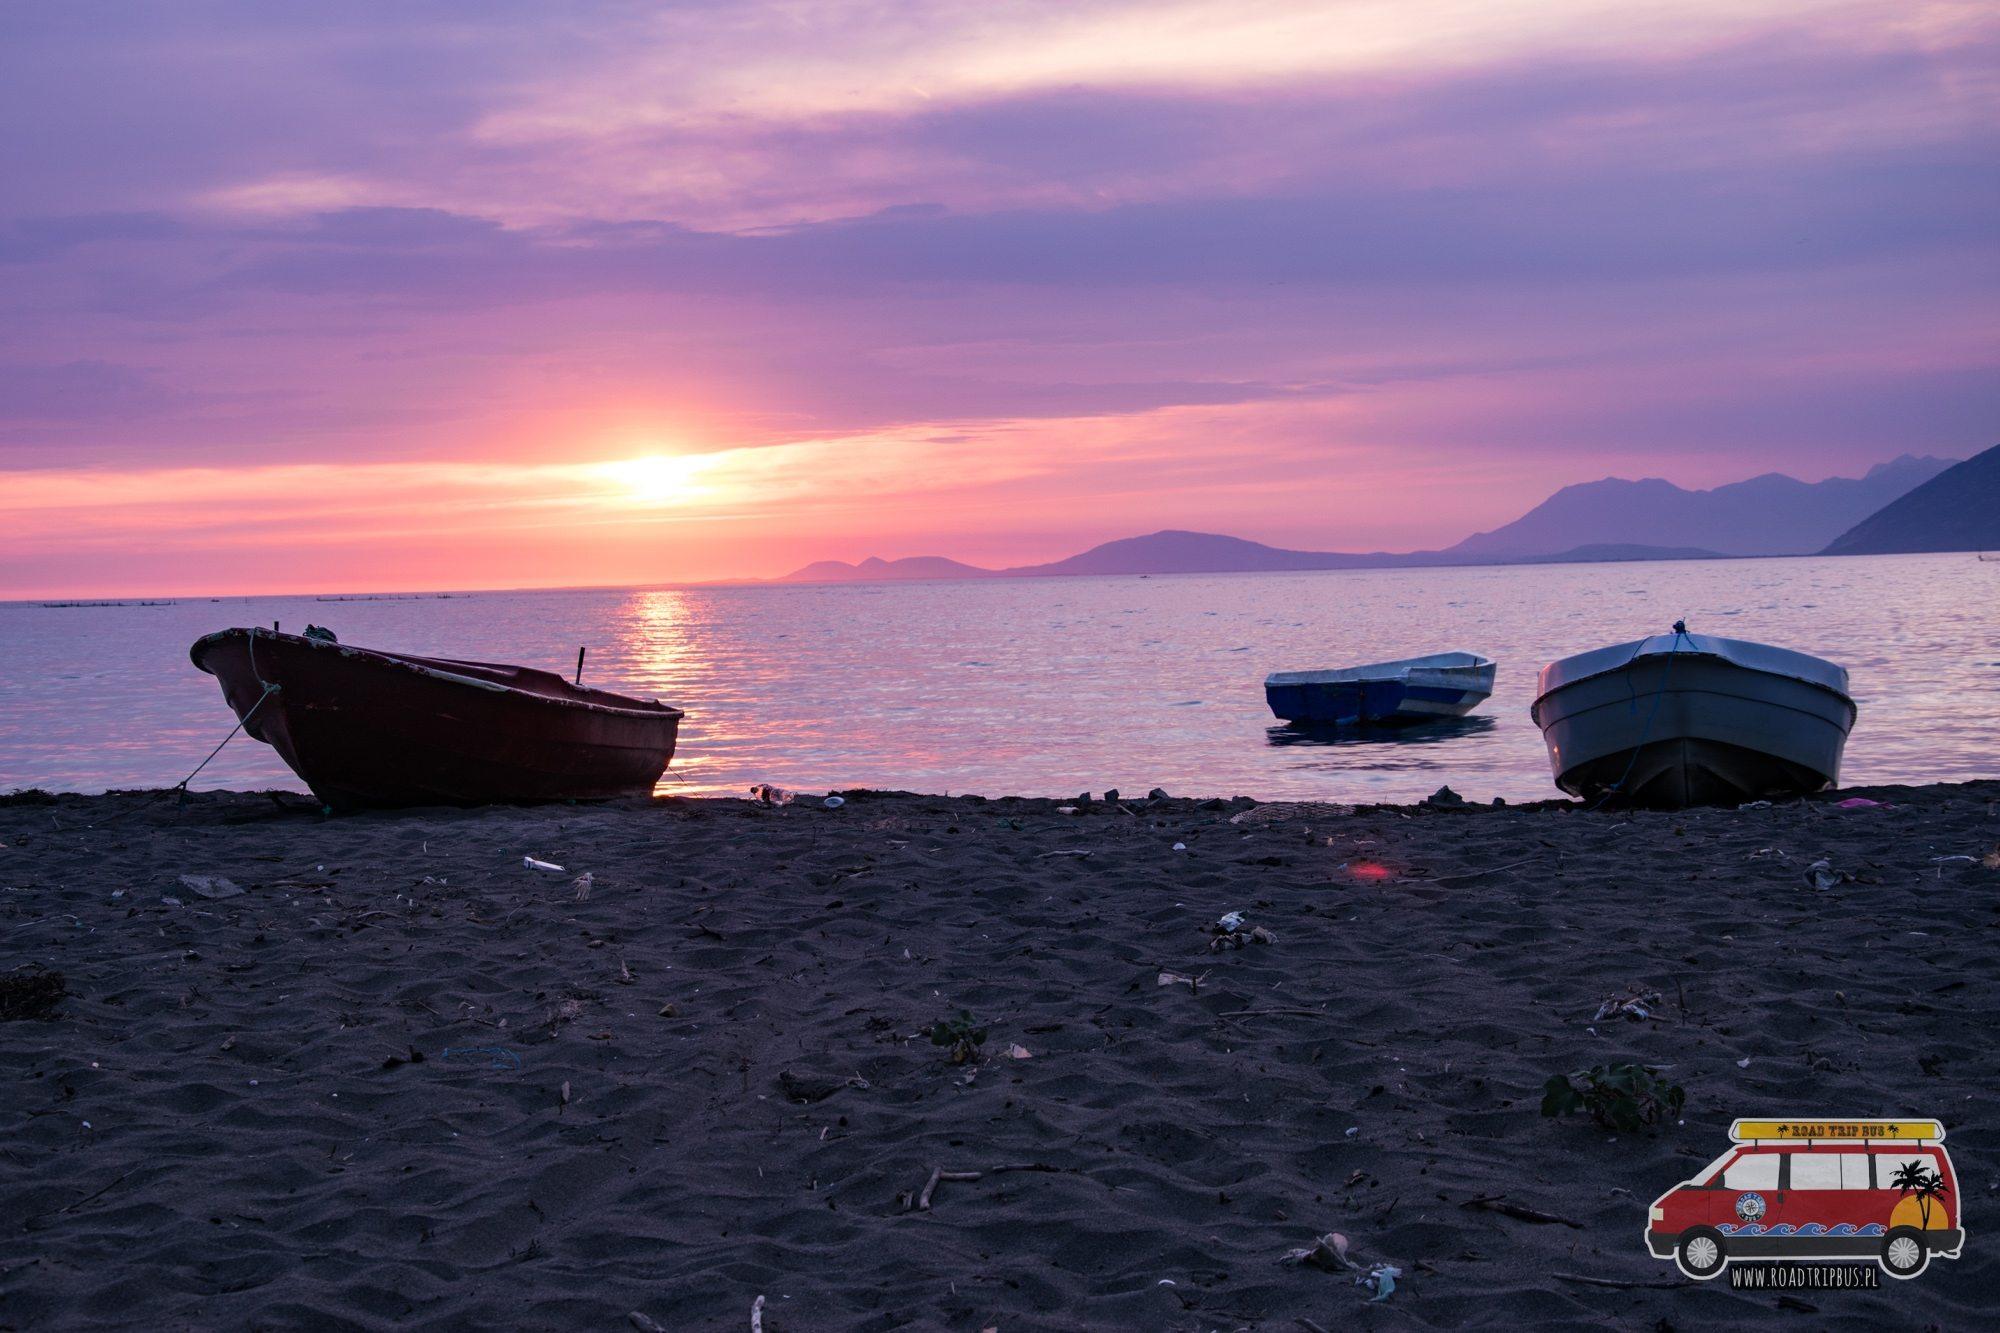 dzika plaża albania nocleg